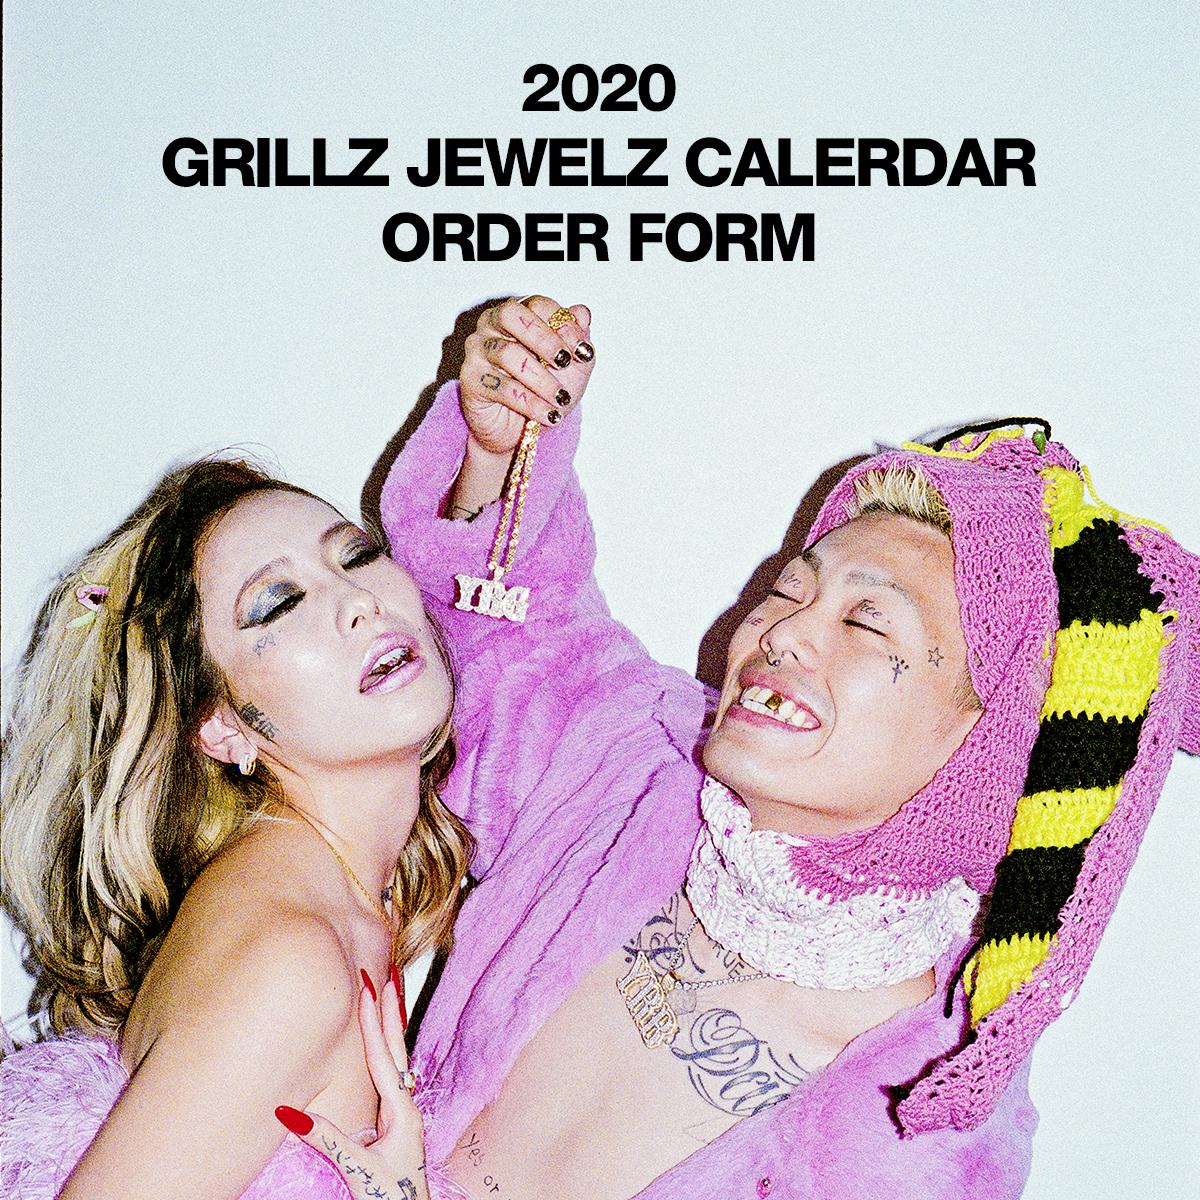 2020 CALENDAR ORDER FORM